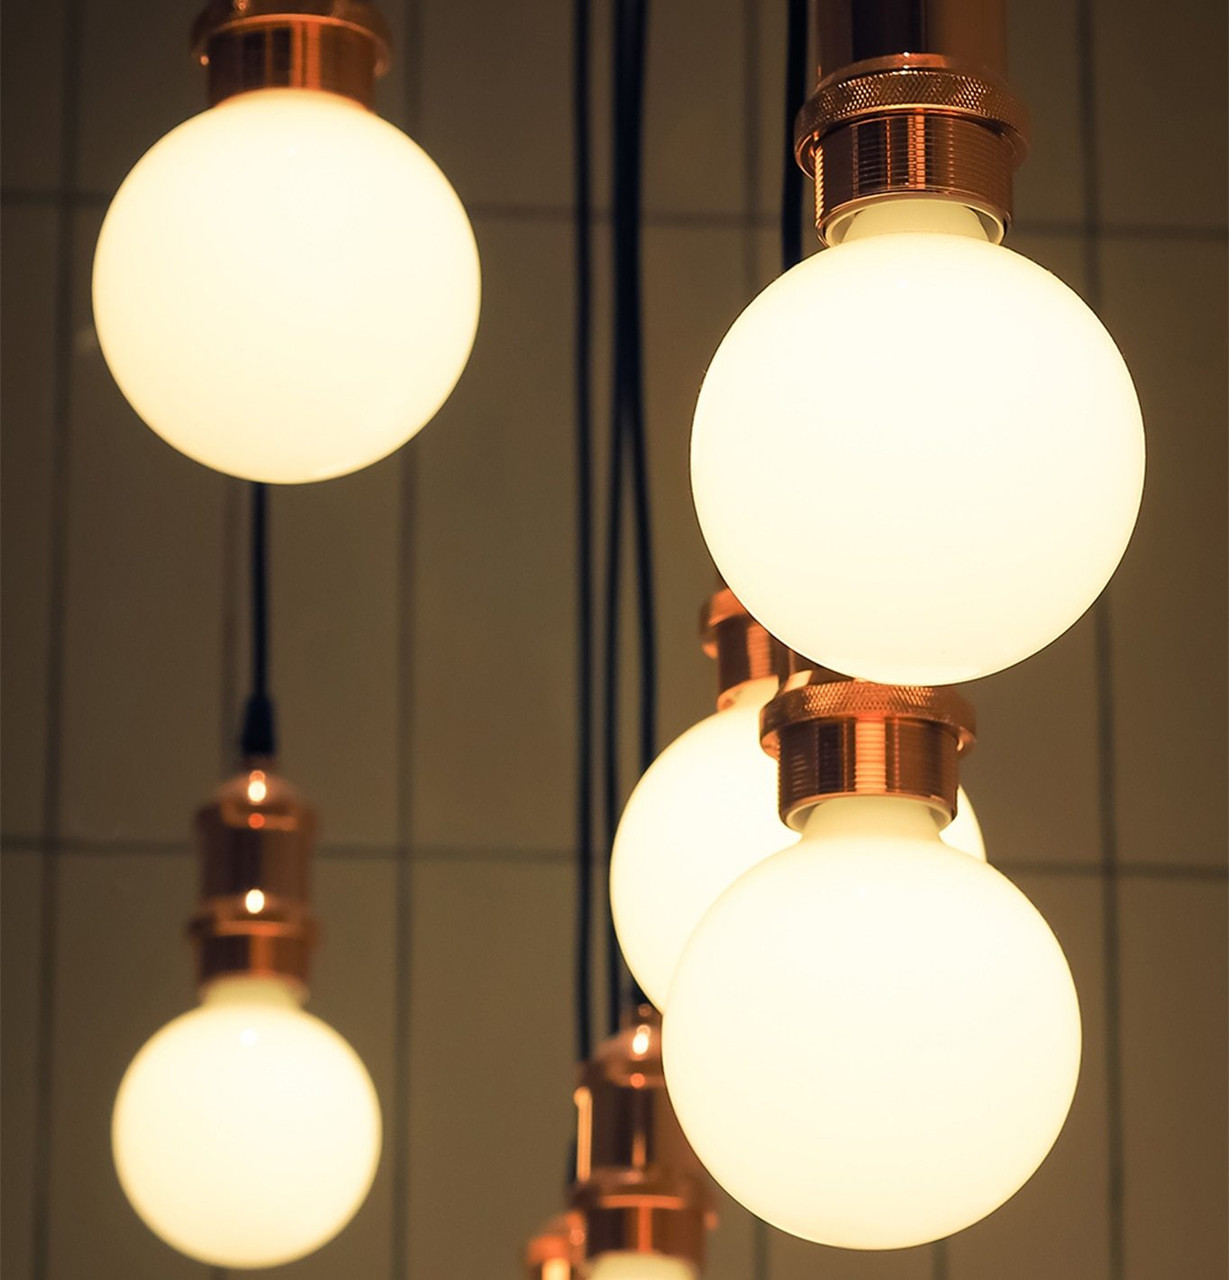 Crompton Lamps LED G125 BC-B22d Light Bulbs